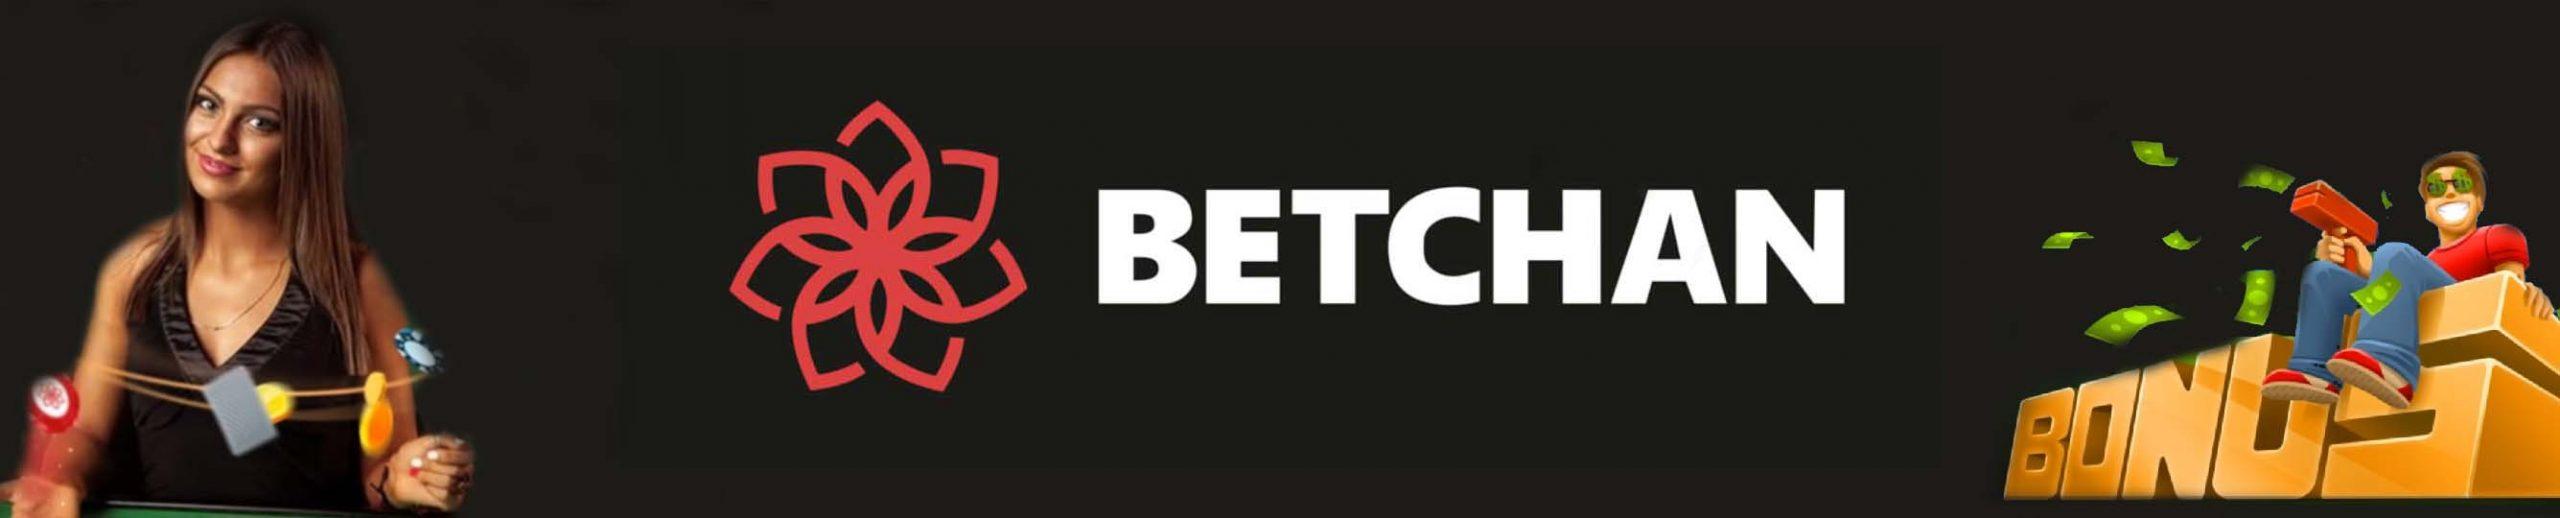 Betchan Casino Test